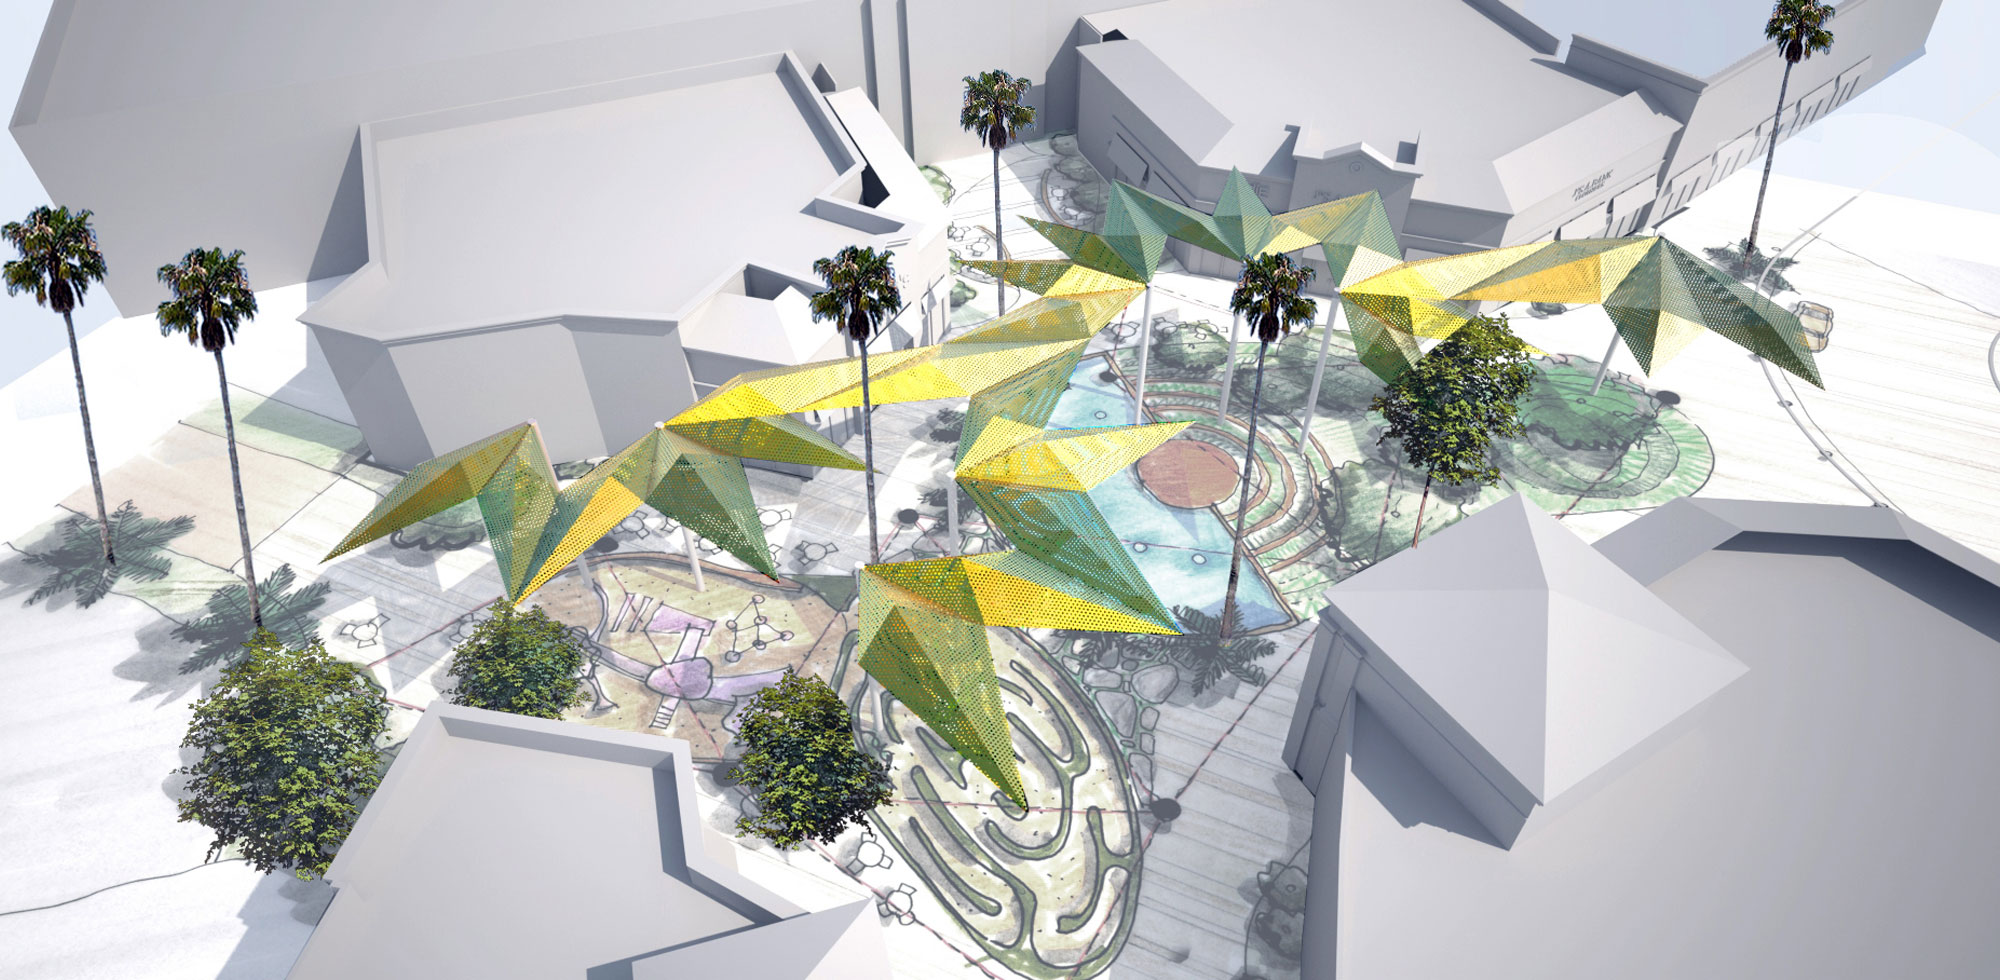 Urban Canopies Poon Design Inc